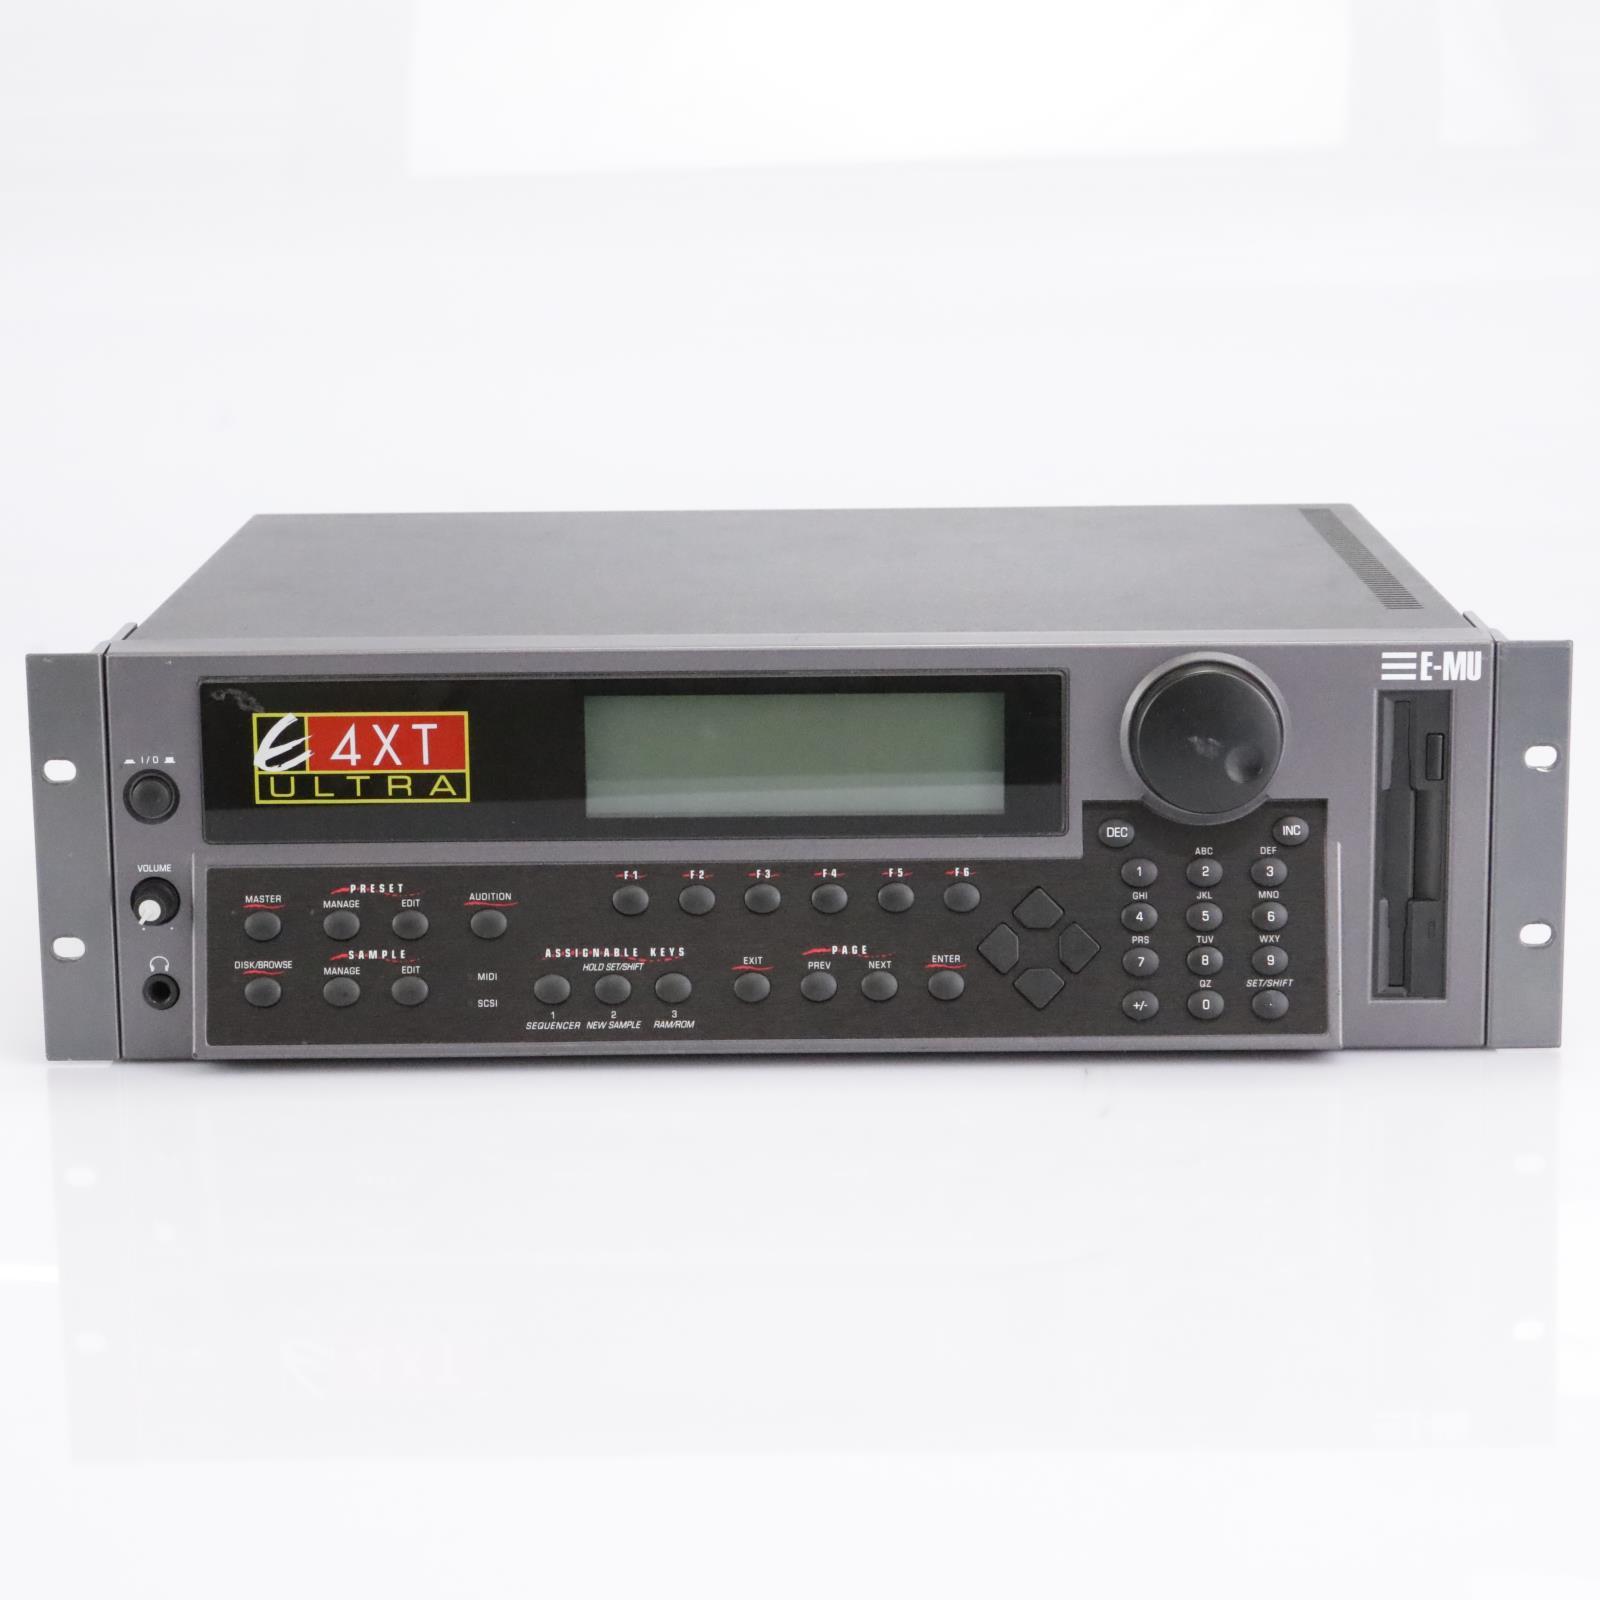 E-MU Systems E4XT Ultra Sampler Rack Module #42689